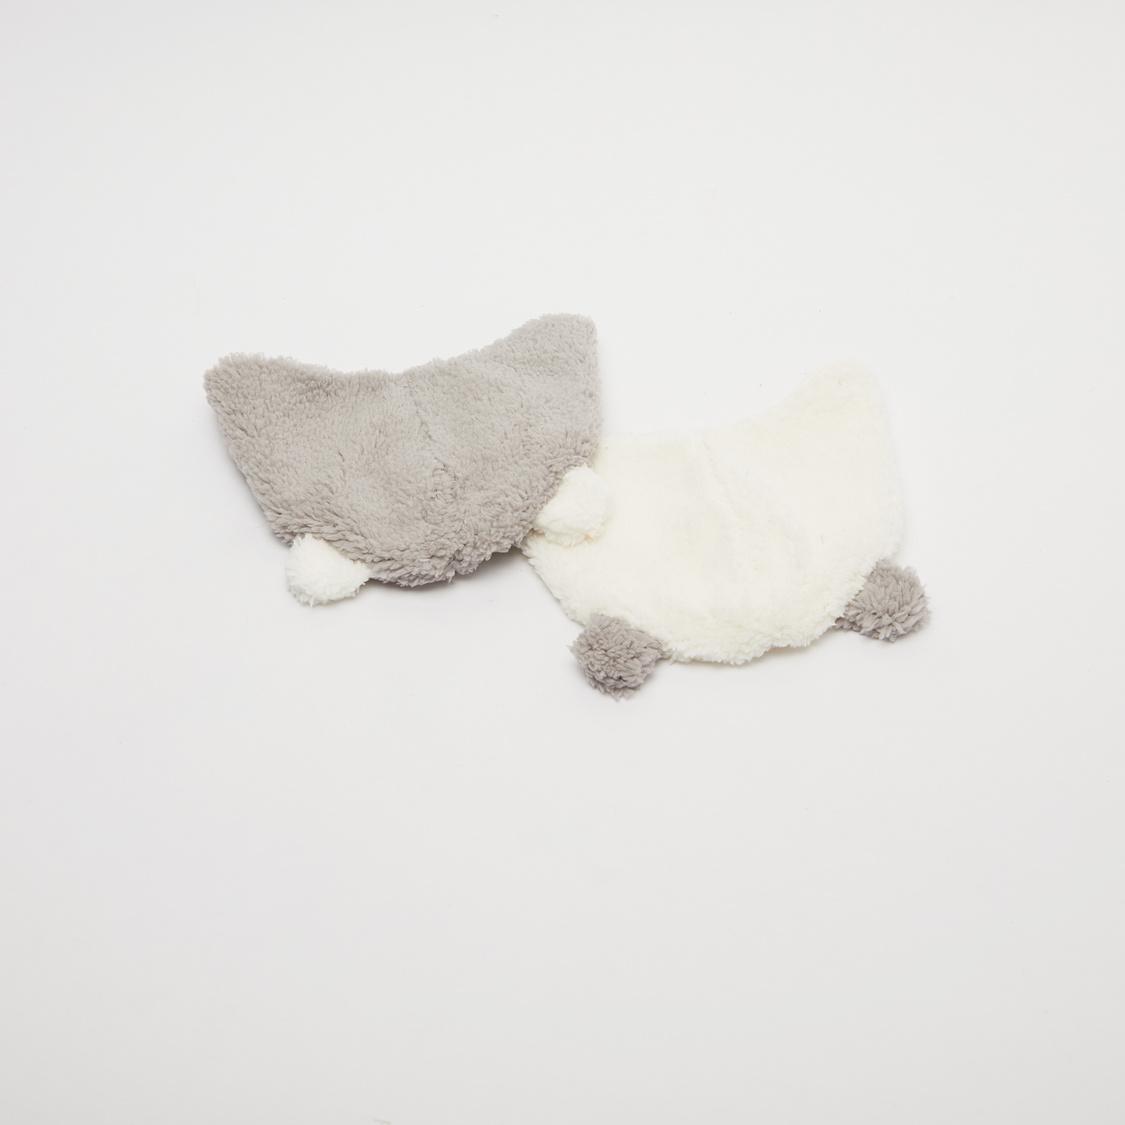 Set of 2 - Plush Textured Beanie Cap